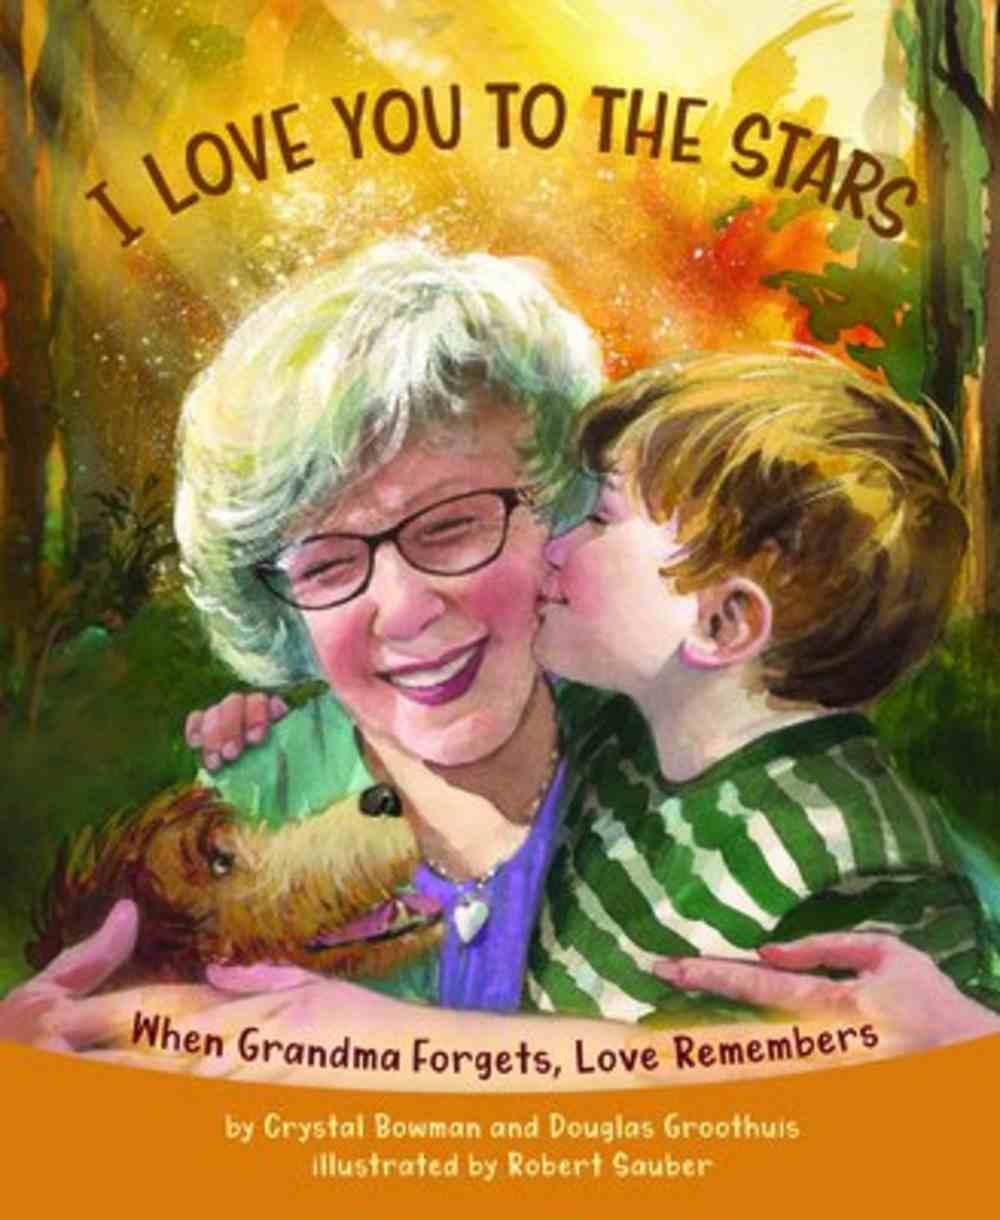 I Love You to the Stars: When Grandma Forgets, Love Remembers Hardback